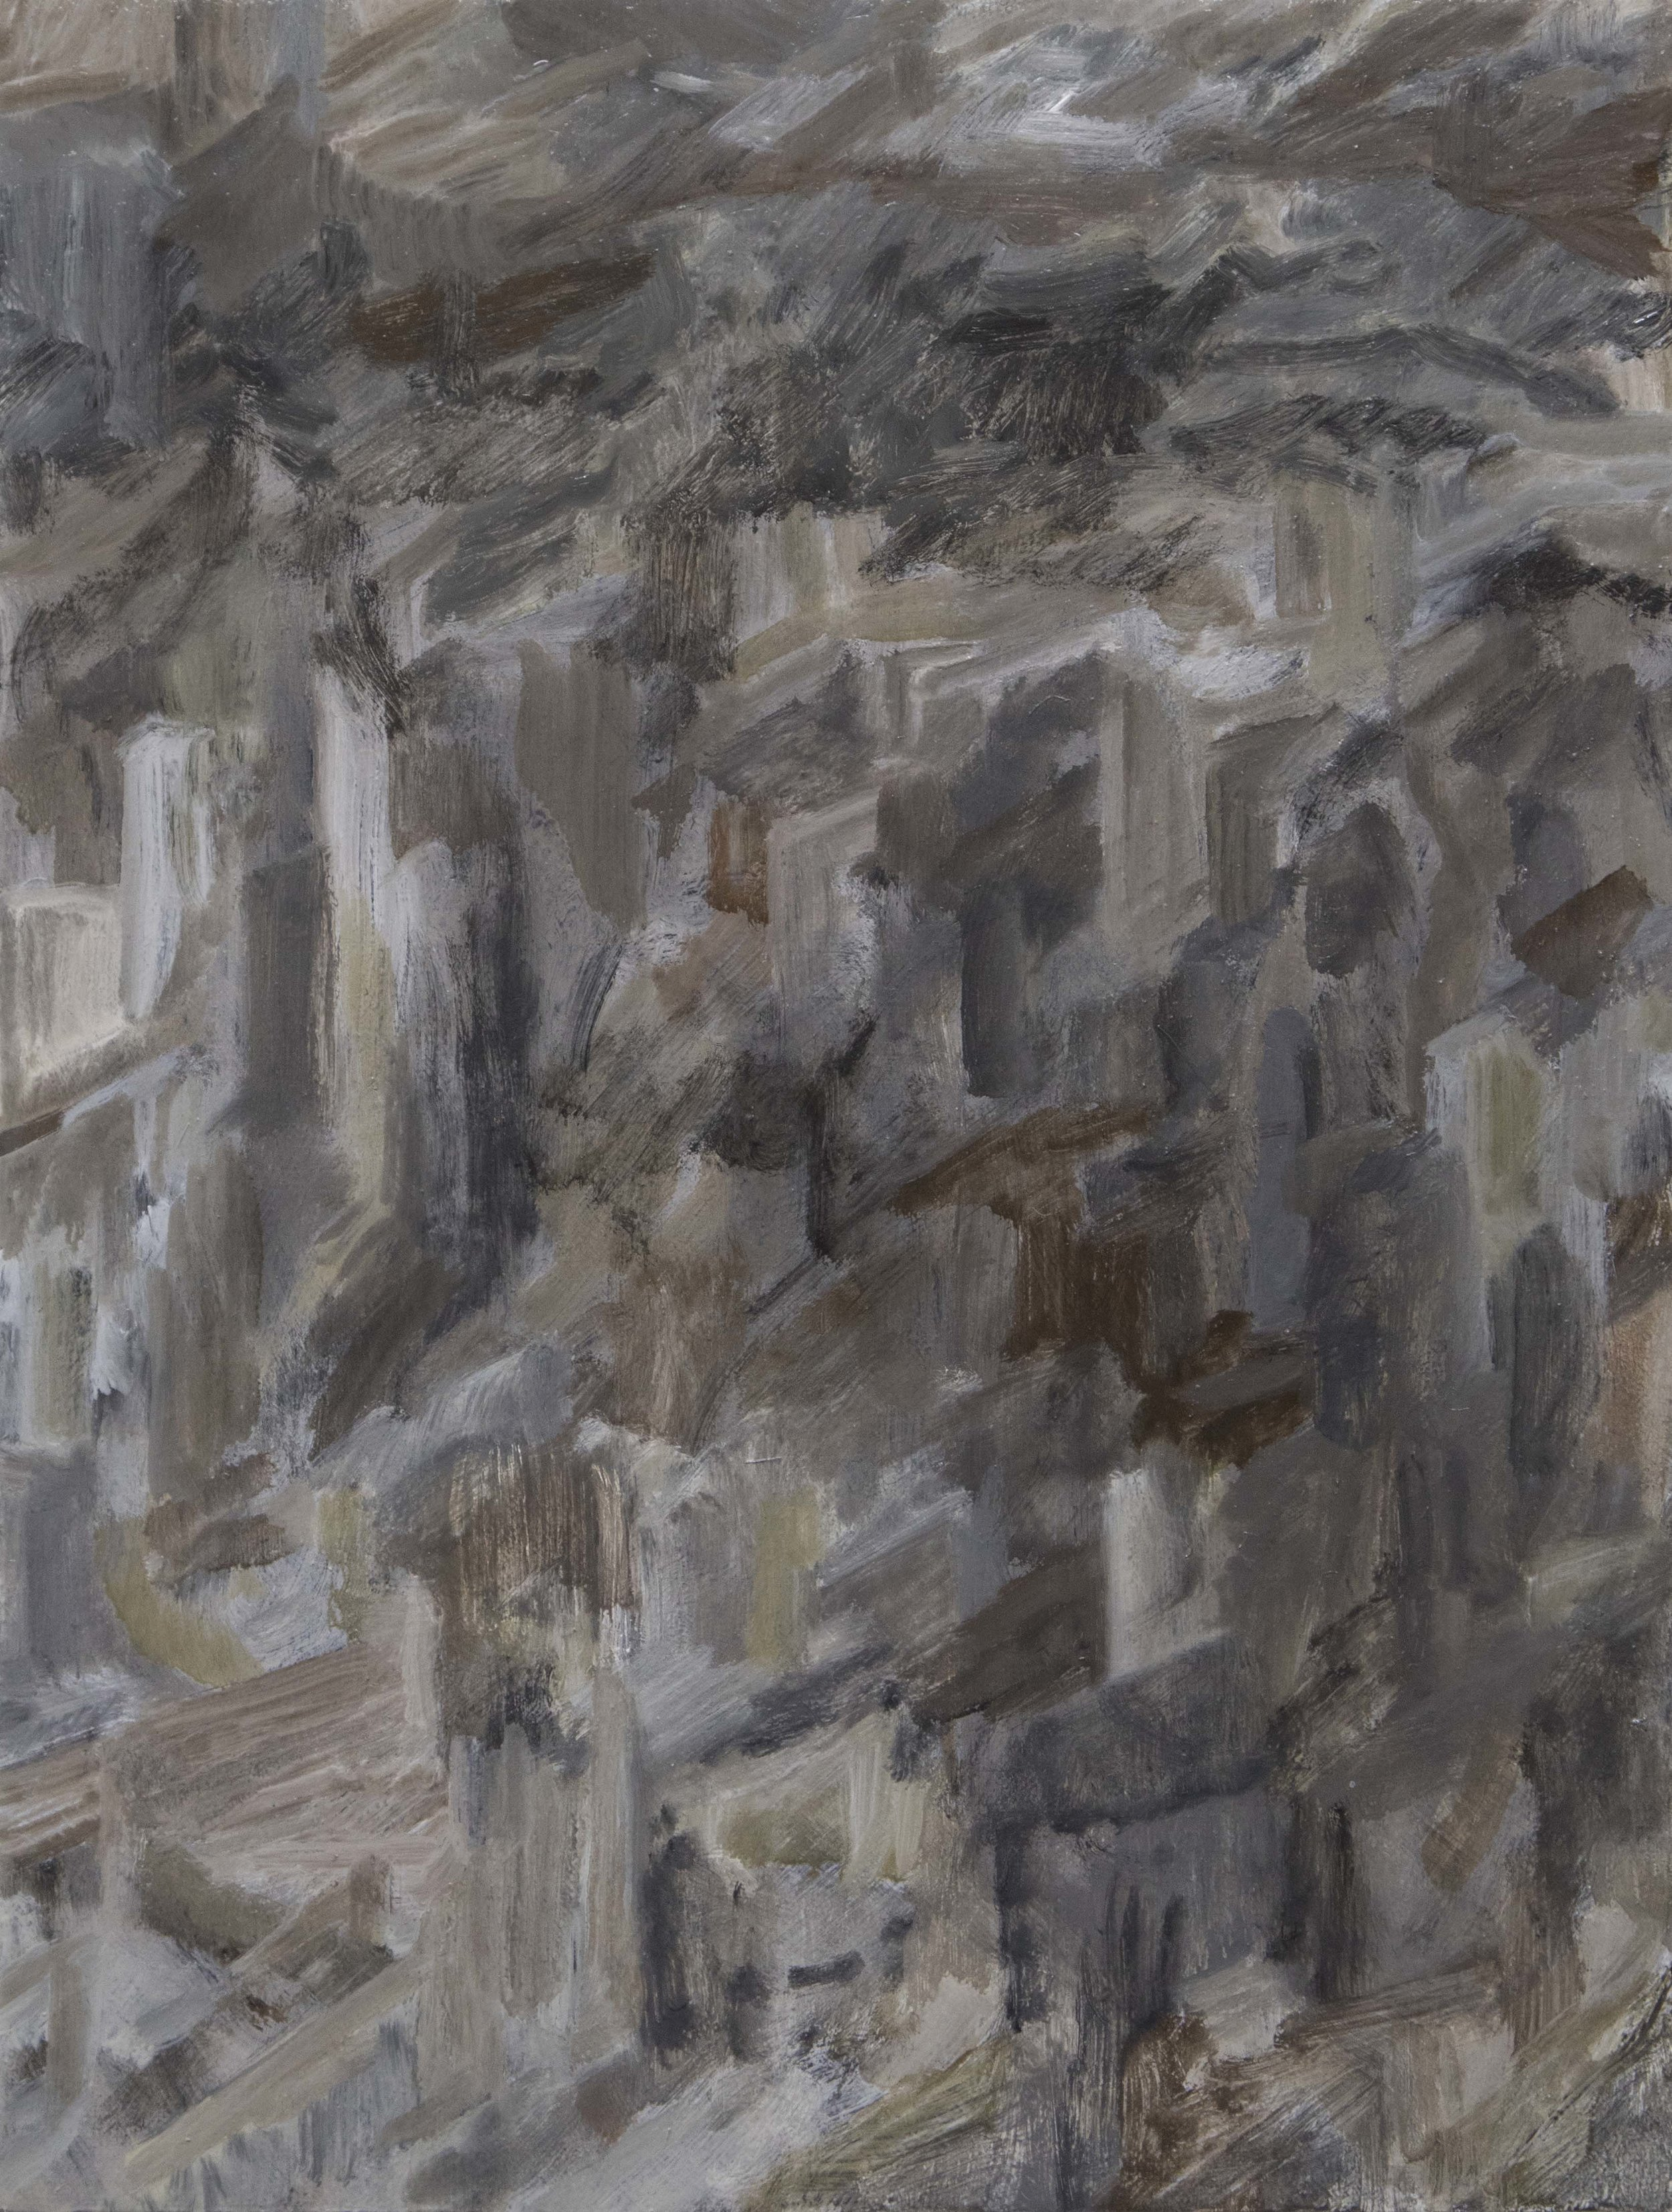 Tim Buckovic, Concrete 444, , 2017, oil on linen, 41 x 31 cm